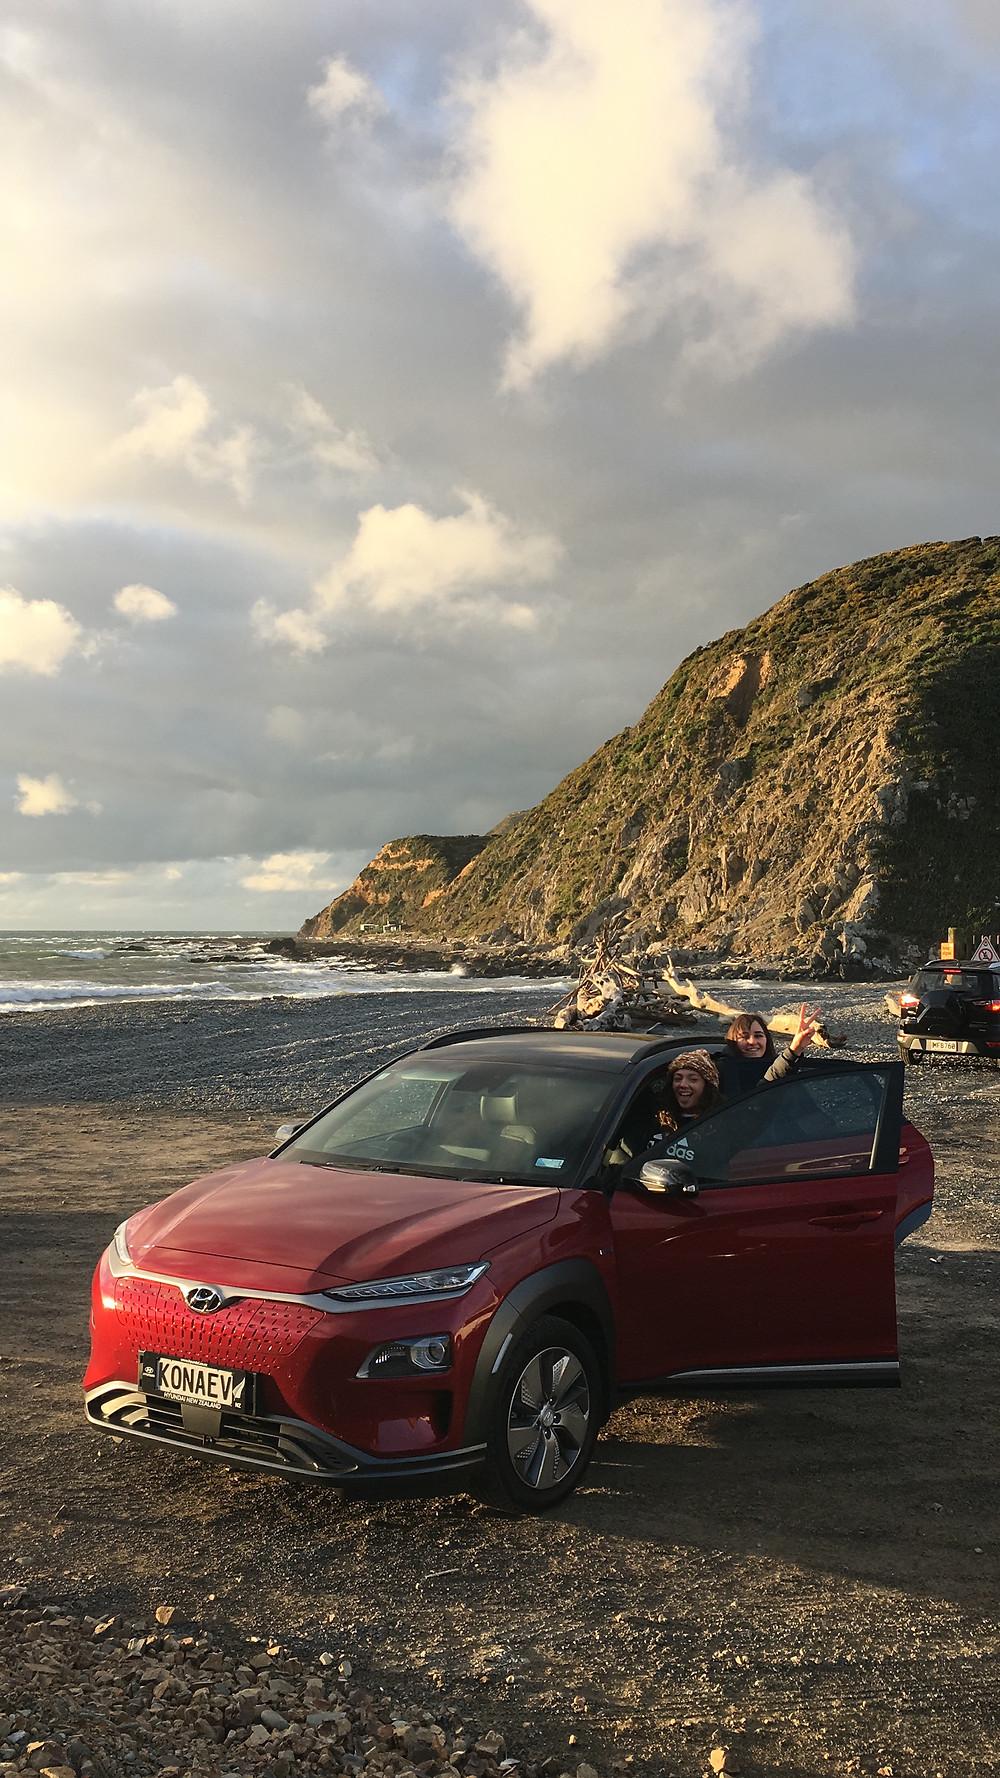 Hyundai Kona Electric 2019 front exterior red Wellington New Zealand Makara beach